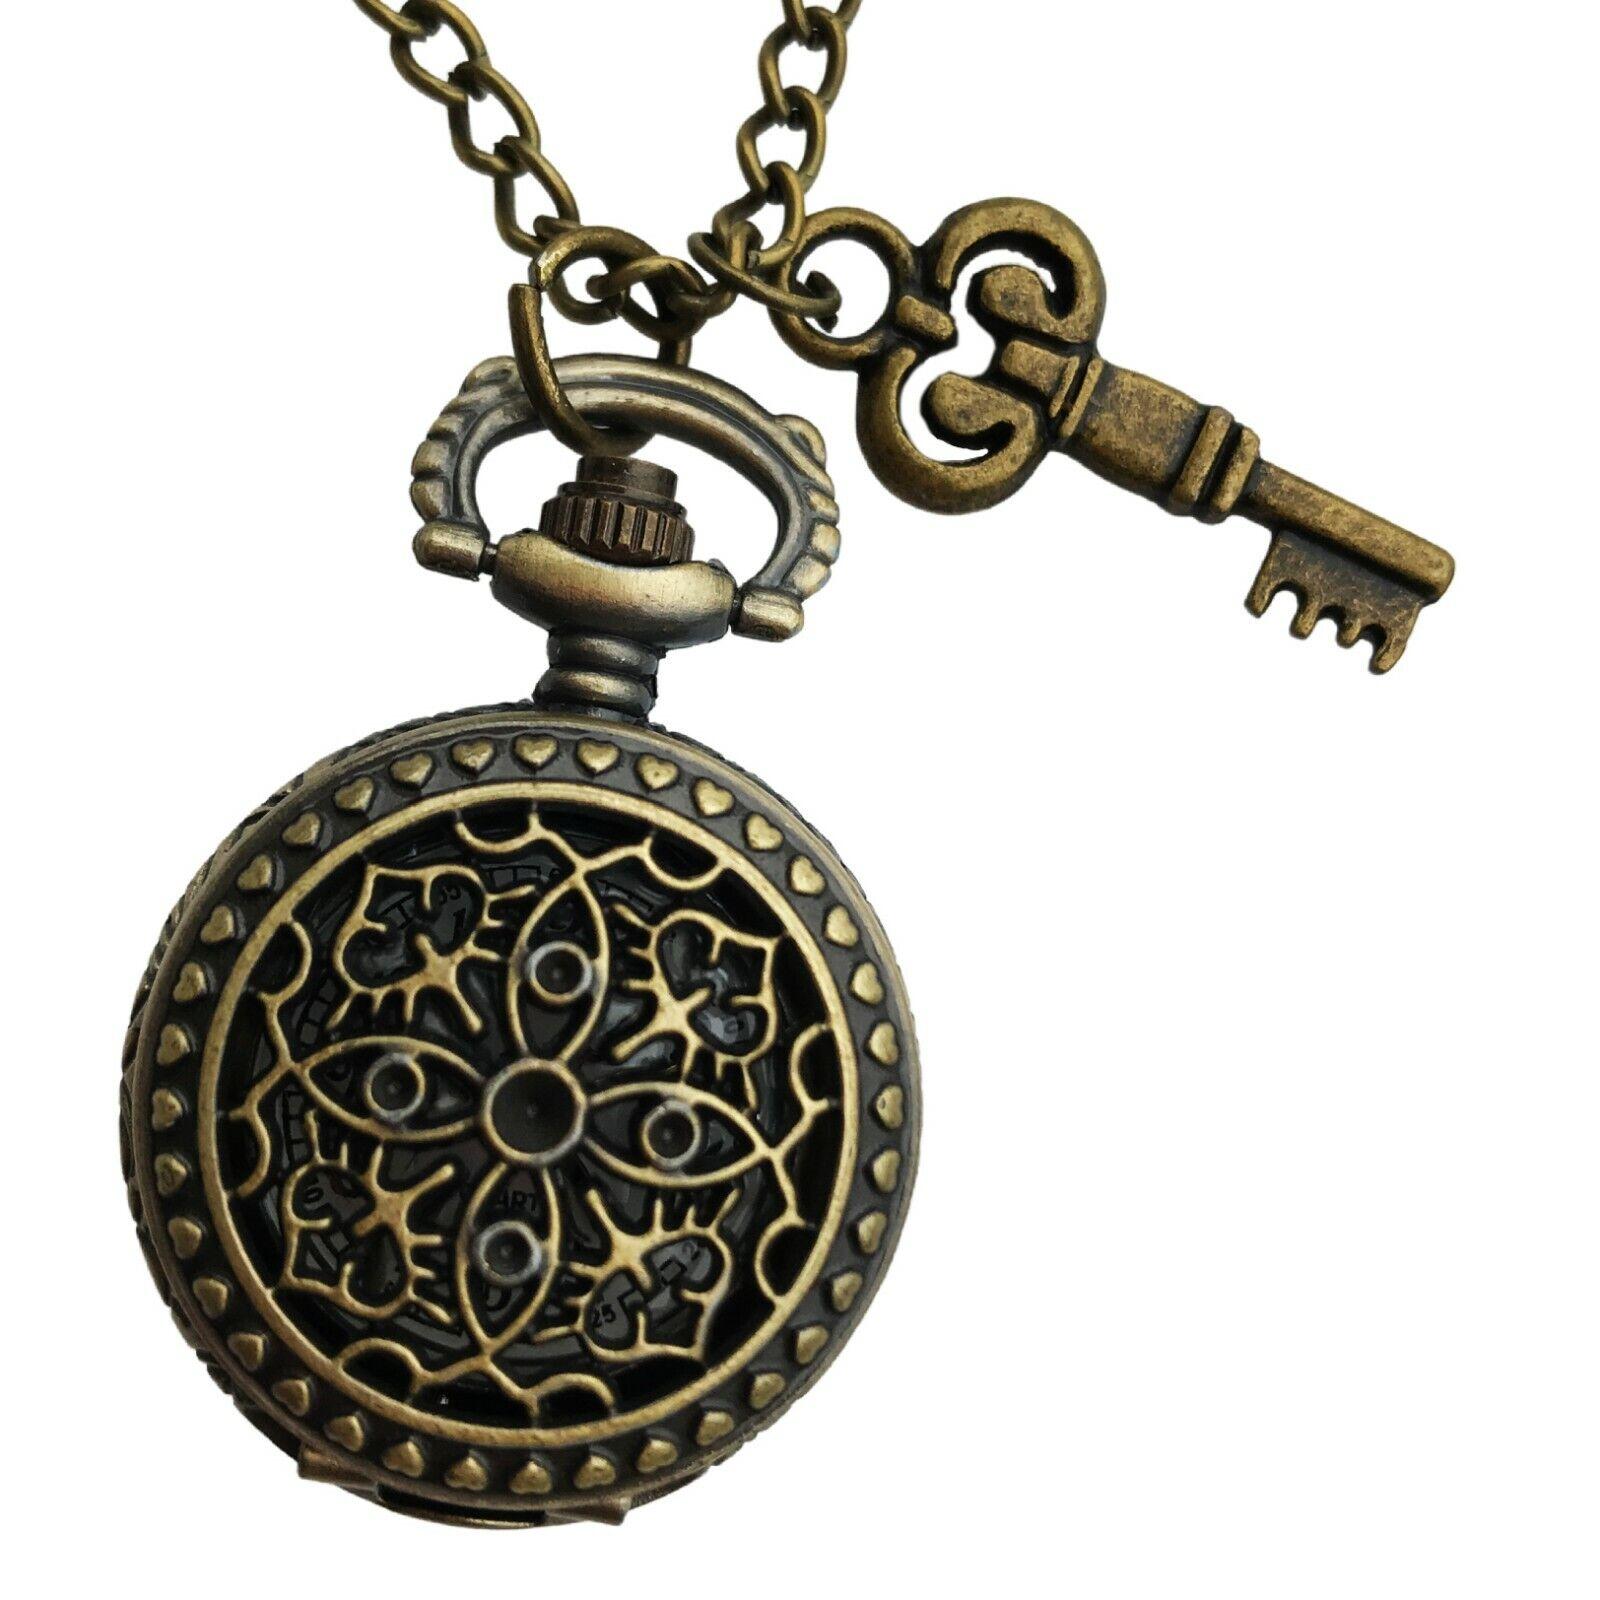 Mustache necklace gears, Steampunk mustache necklace Victorian steampunk necklace vintage jewelry Cosplay jewelry Steampunk necklace